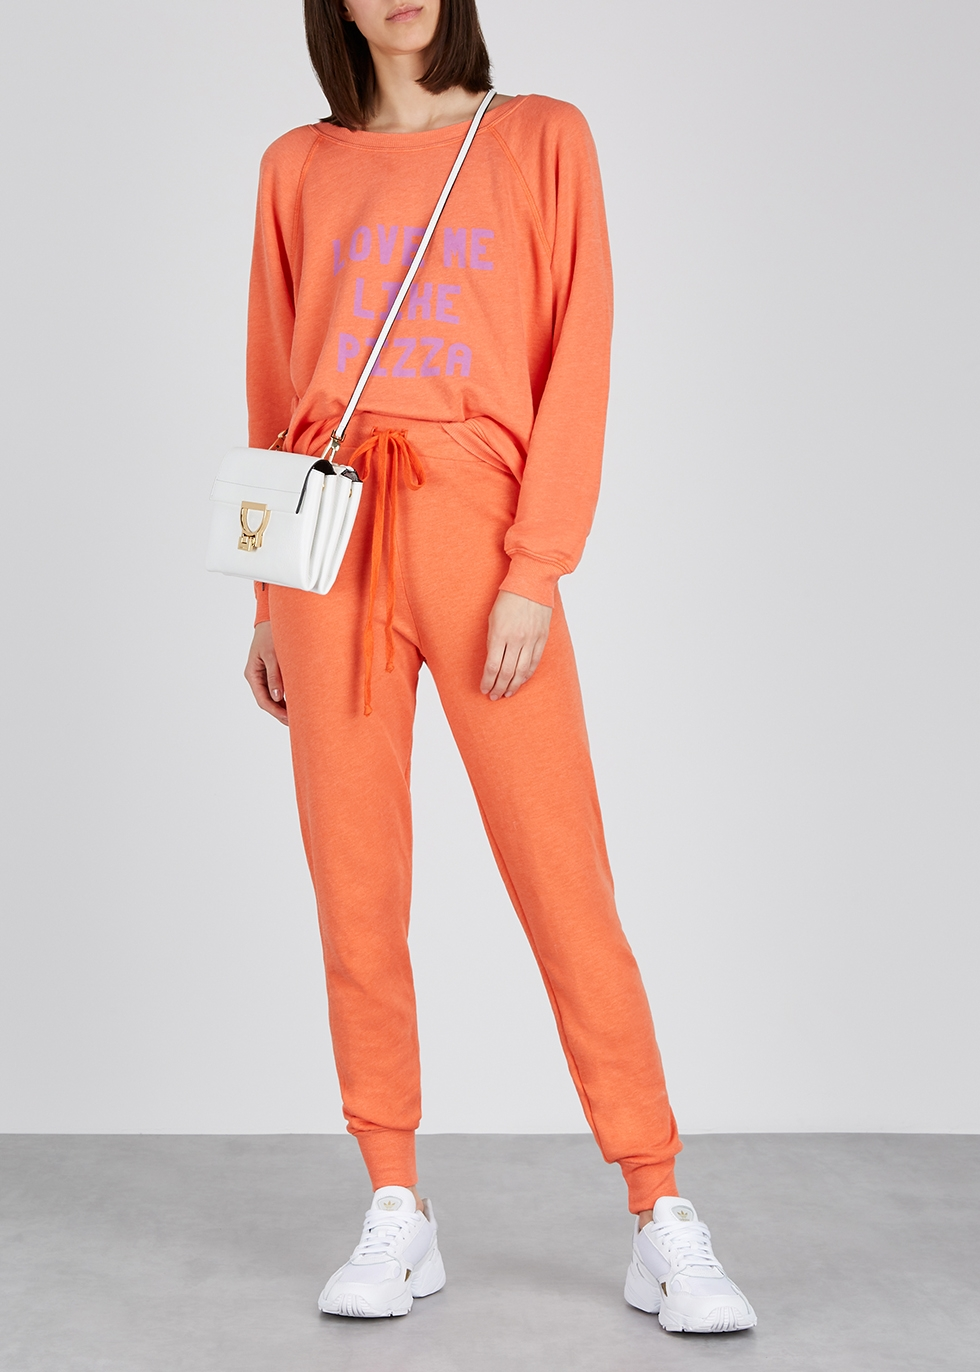 Sommers orange printed jersey sweatshirt - Wildfox